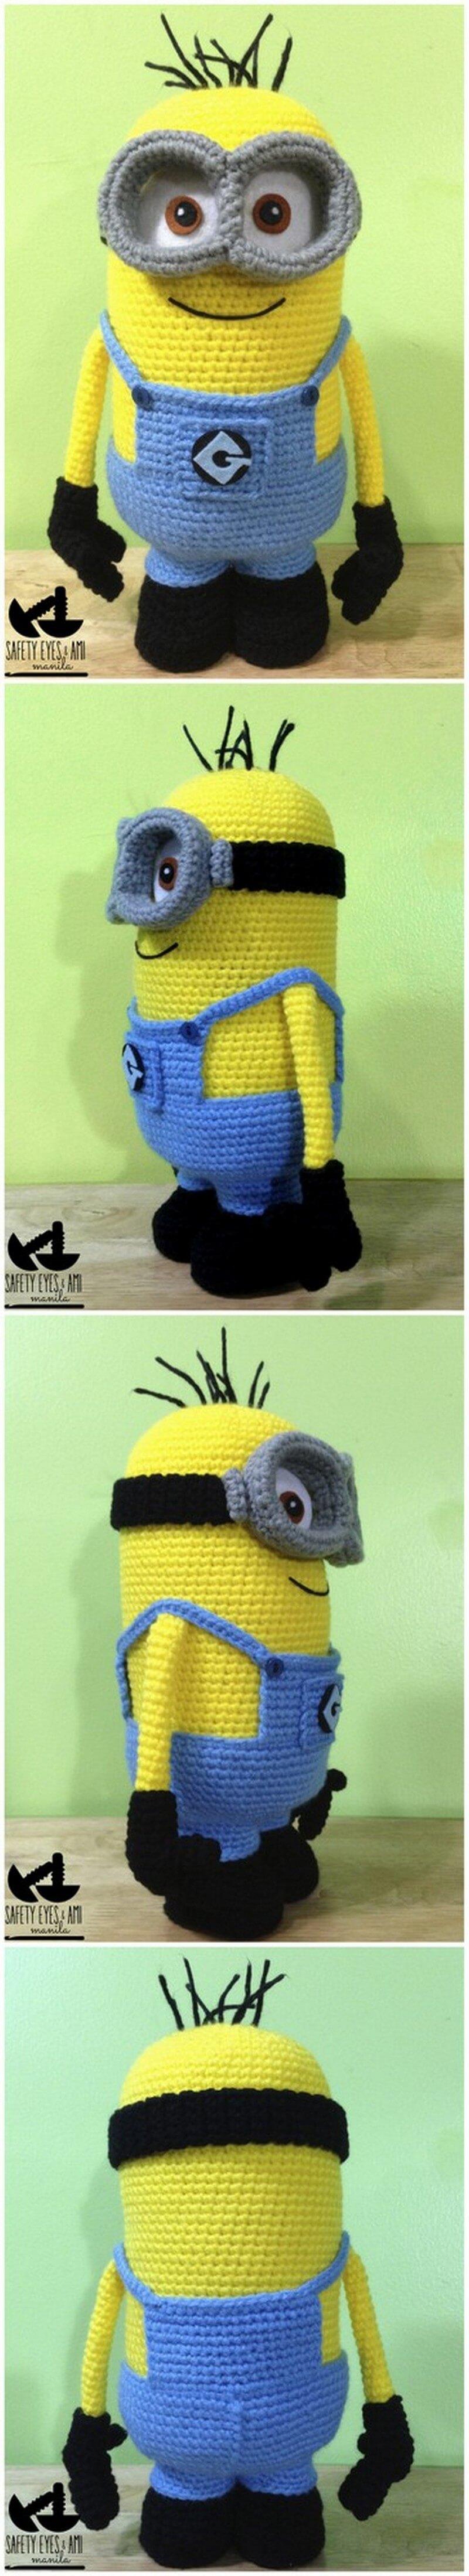 Free Crochet Amigurumi Pattern (4)